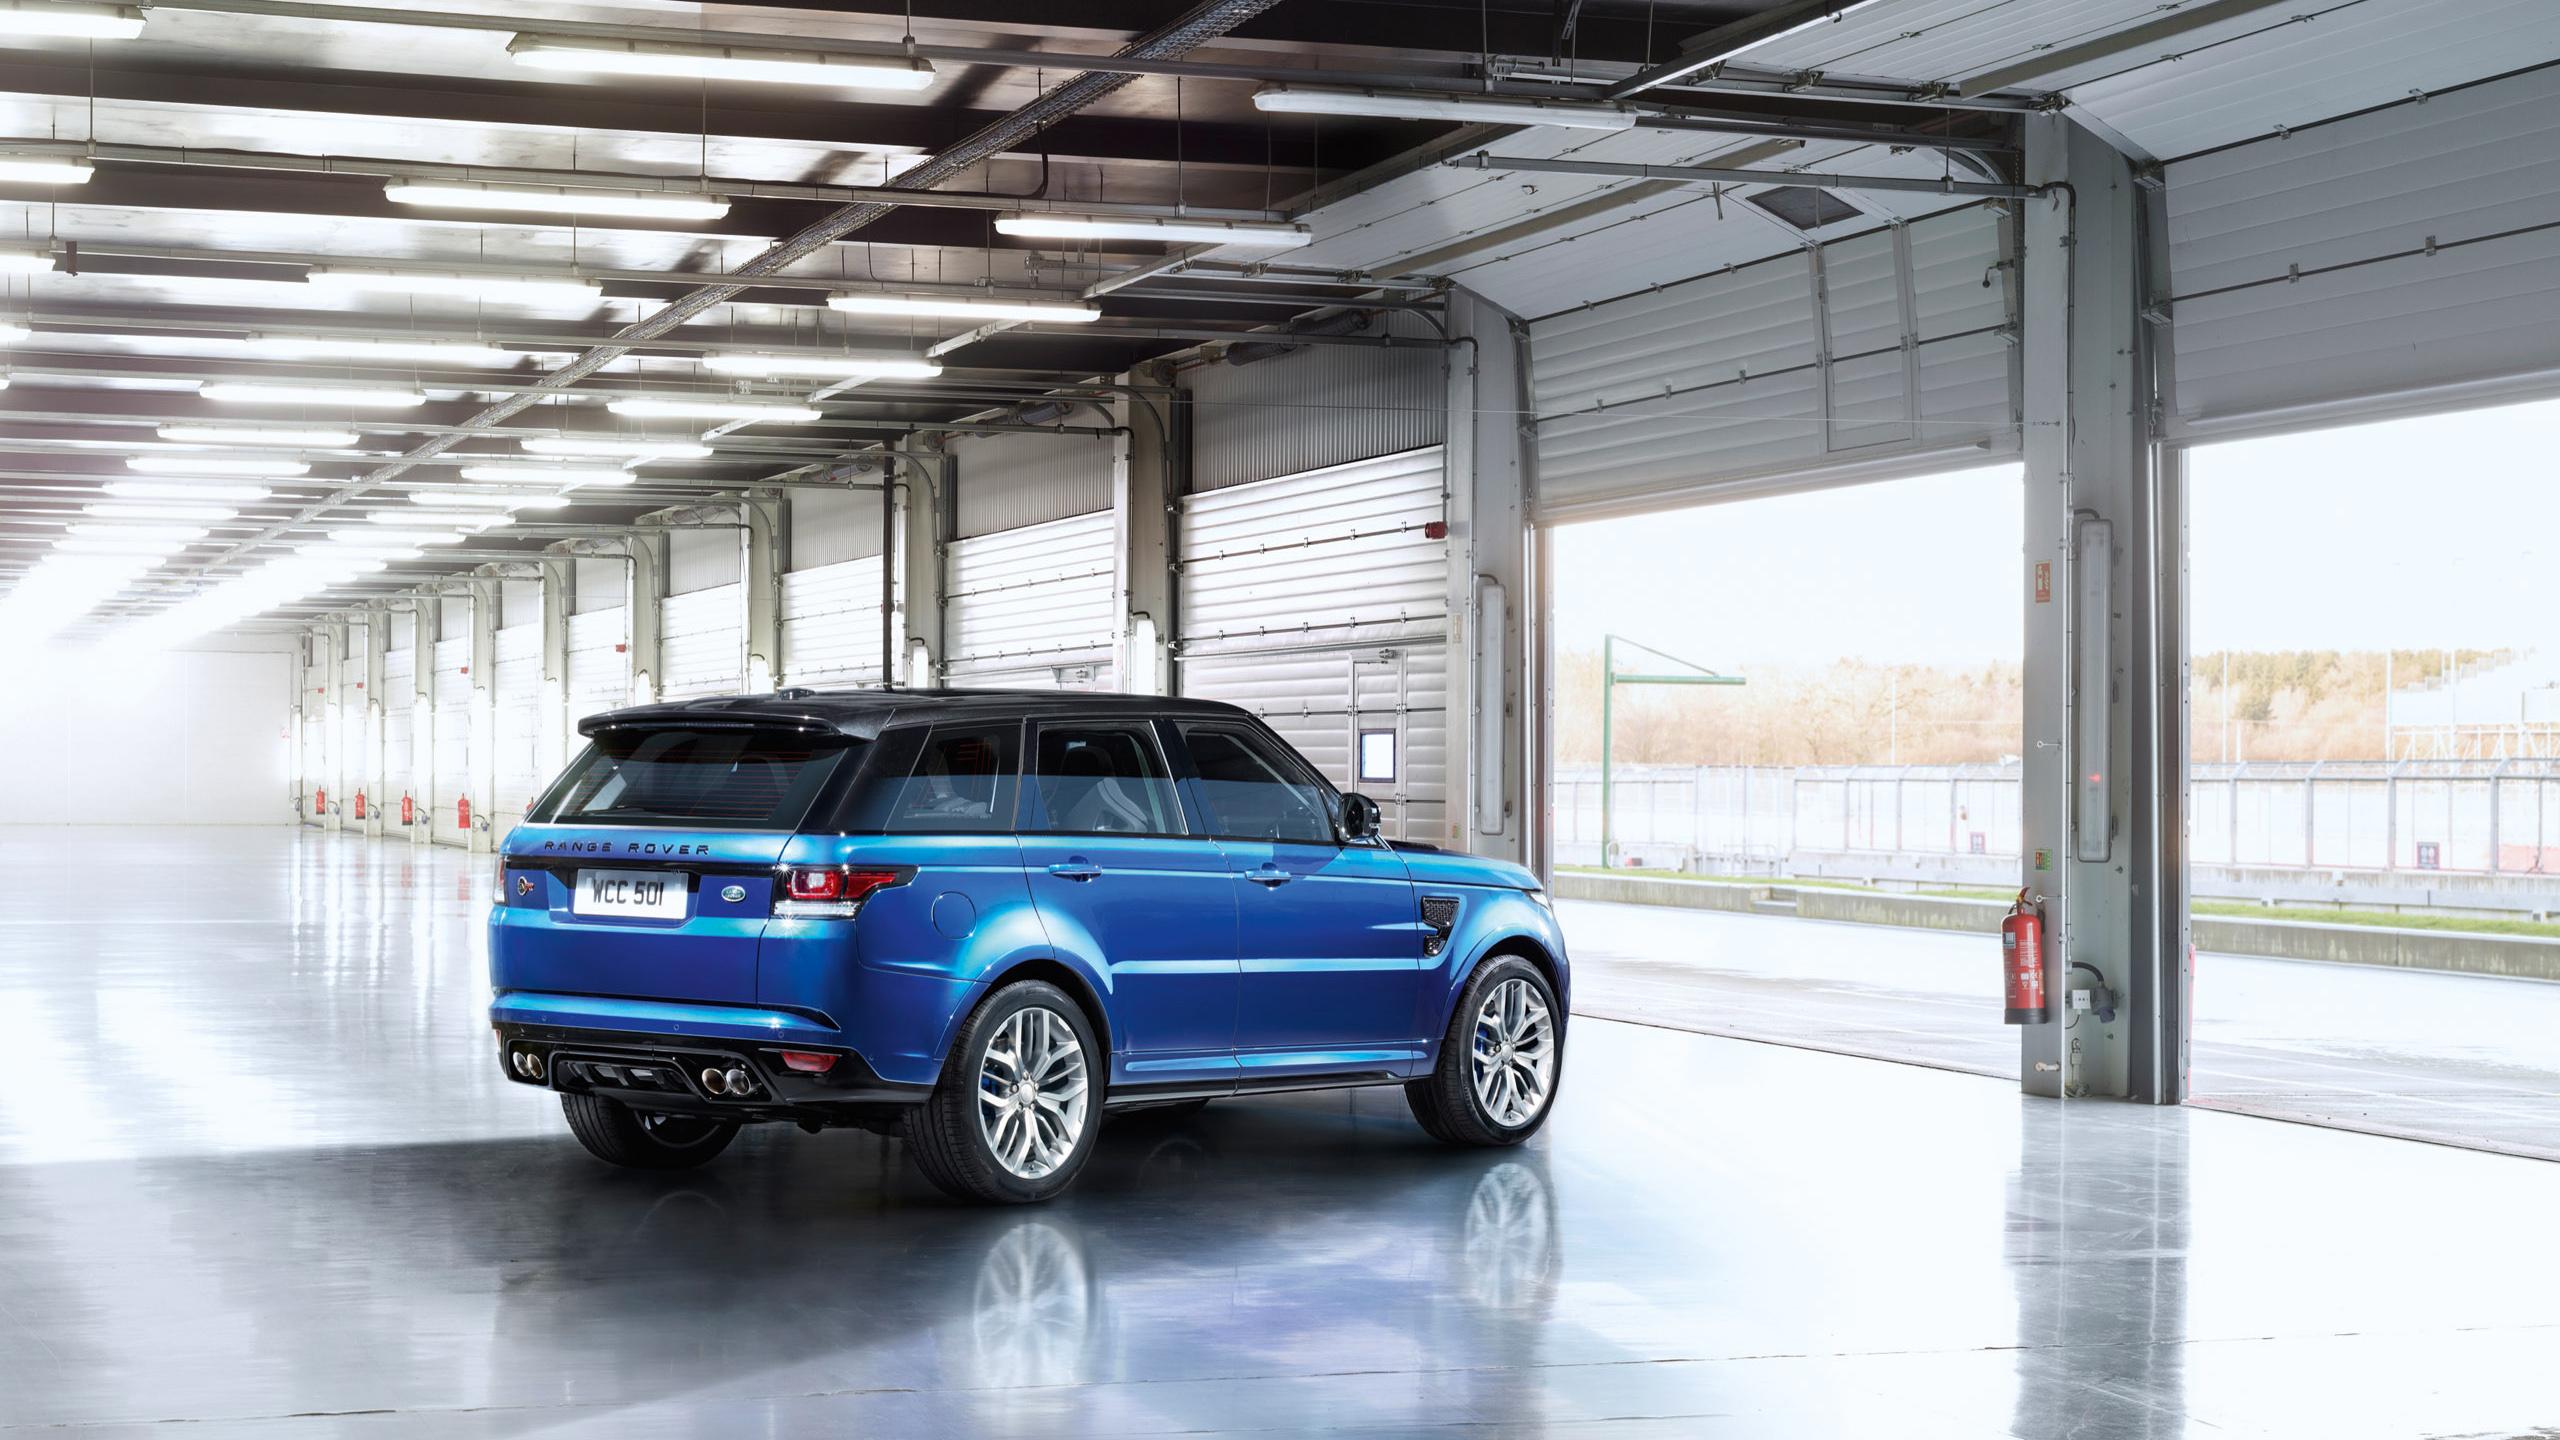 2015 Range Rover Sport SVR 2 Wallpaper   HD Car Wallpapers   ID 4712